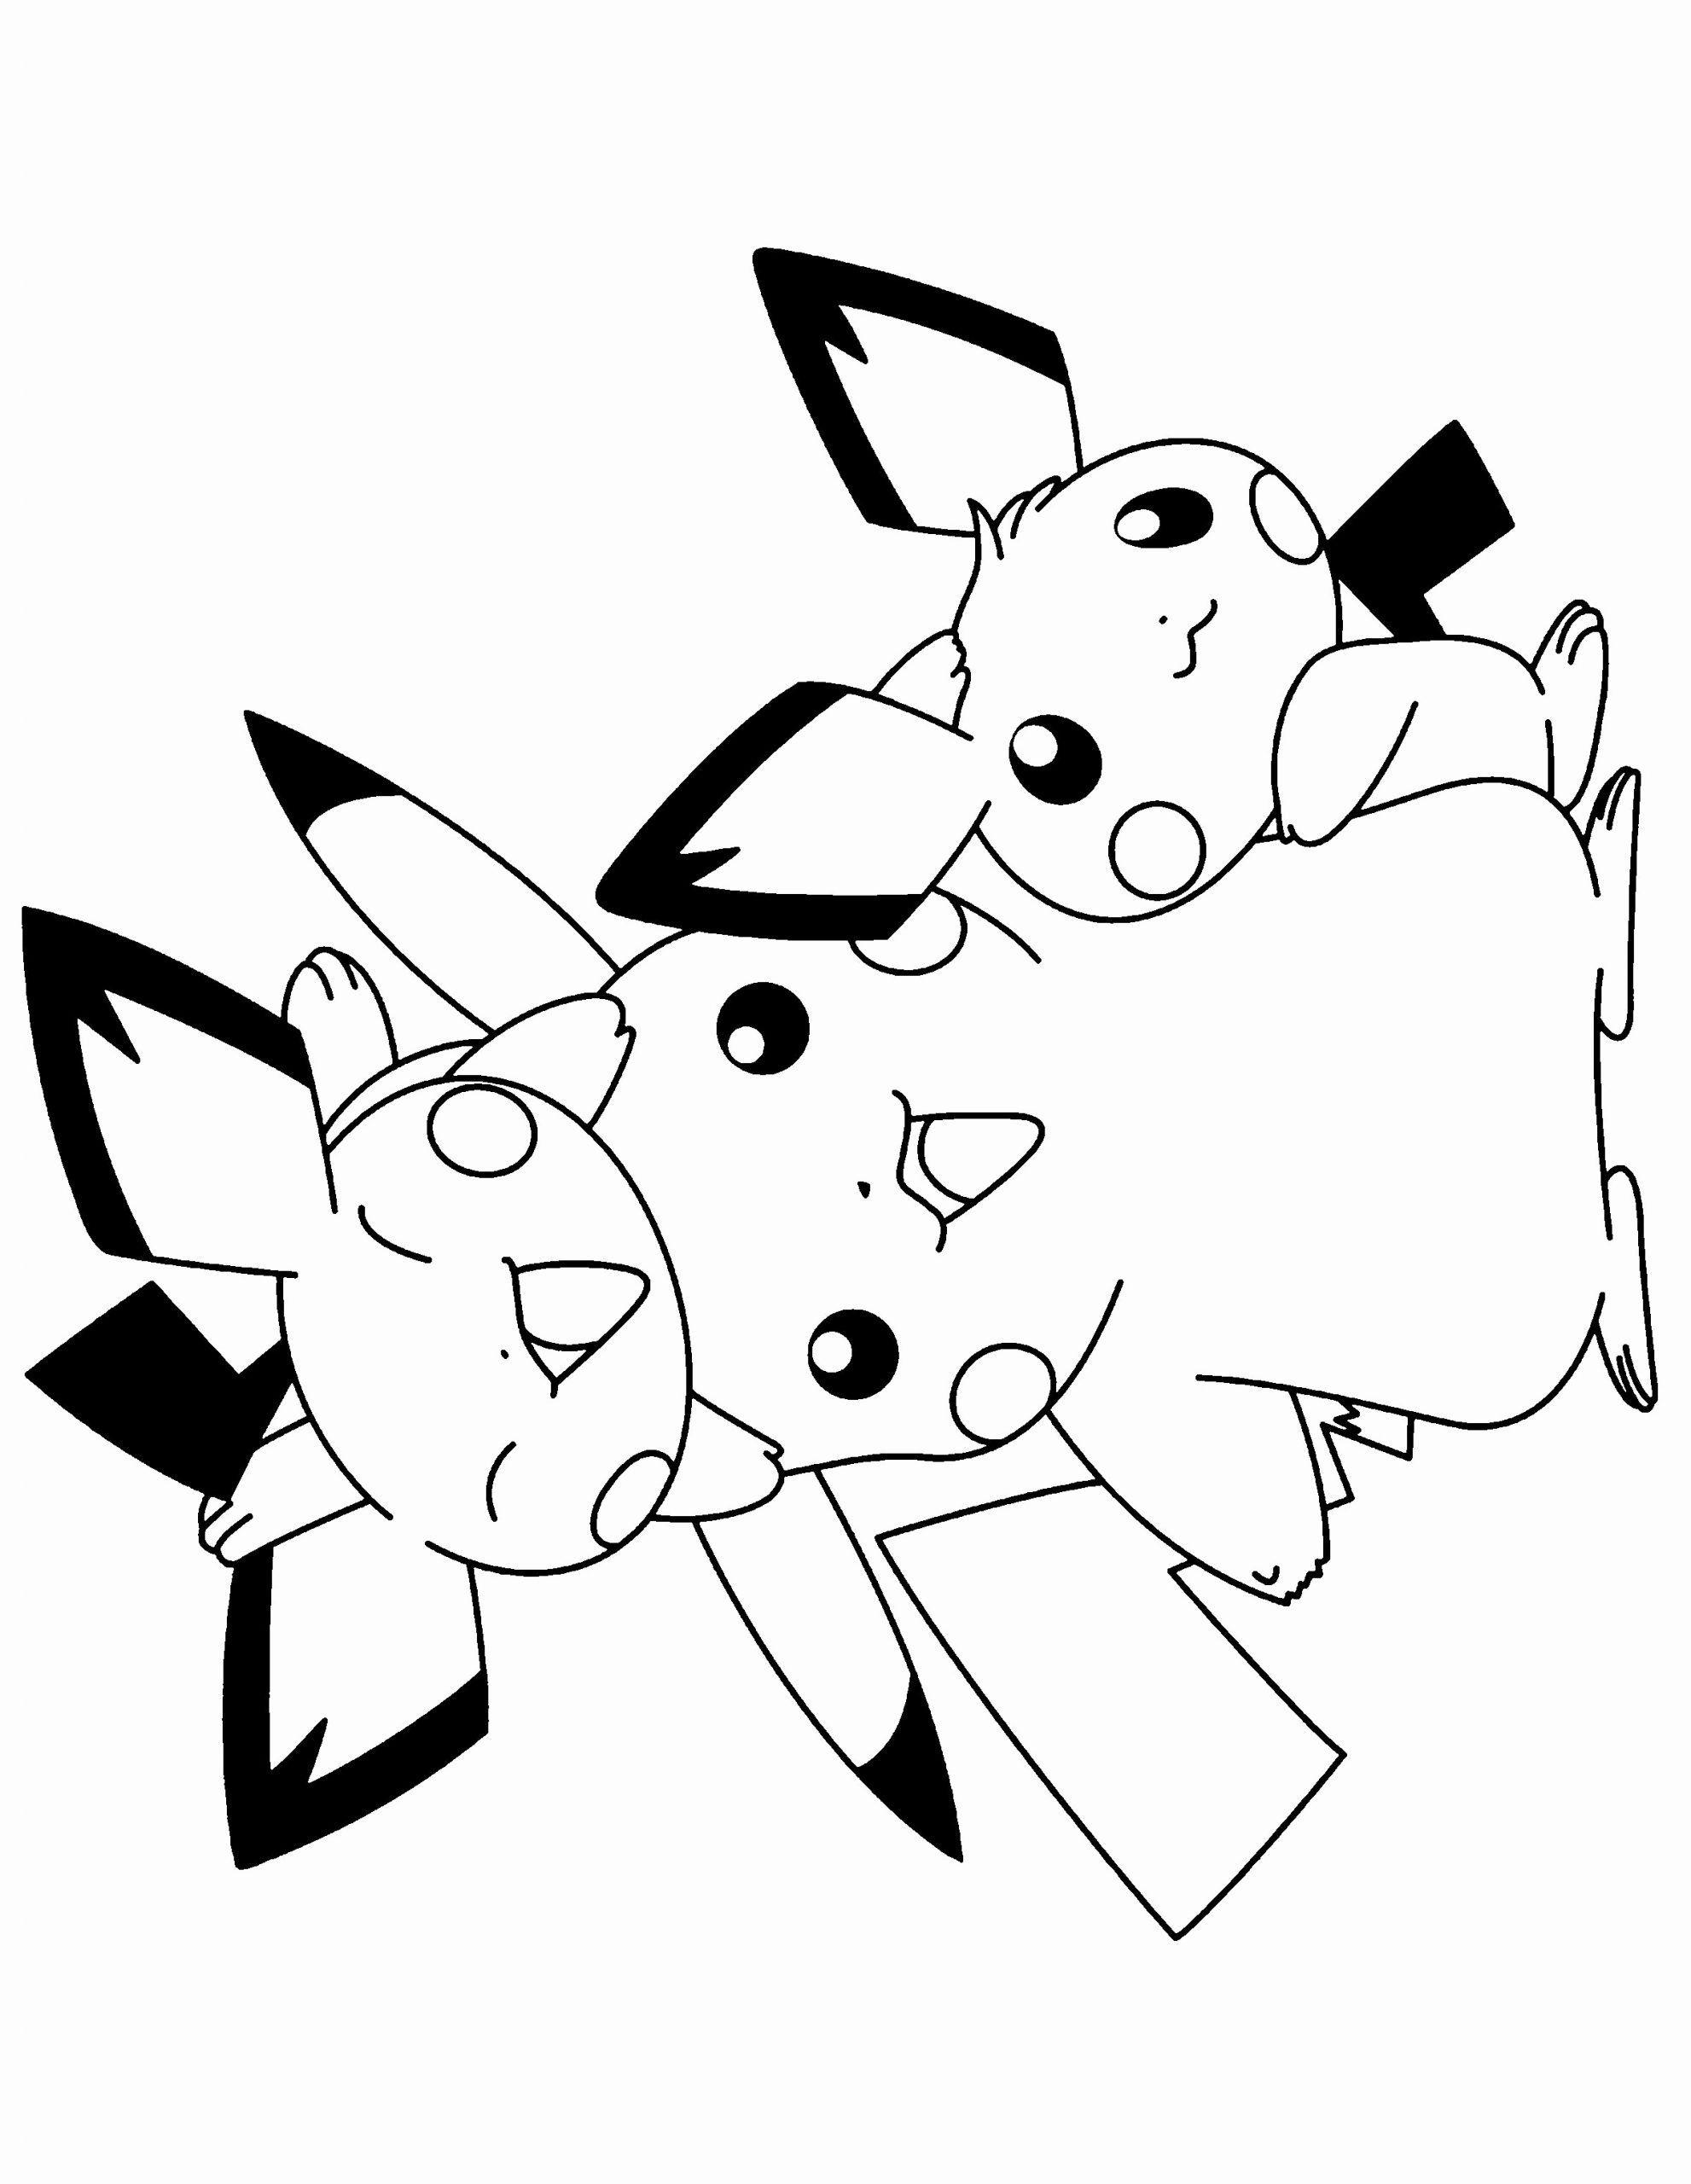 Alolan Raichu Coloring Page Beautiful 28 A An Raichu Coloring Page In 2020 Pokemon Coloring Pages Pikachu Coloring Page Cartoon Coloring Pages